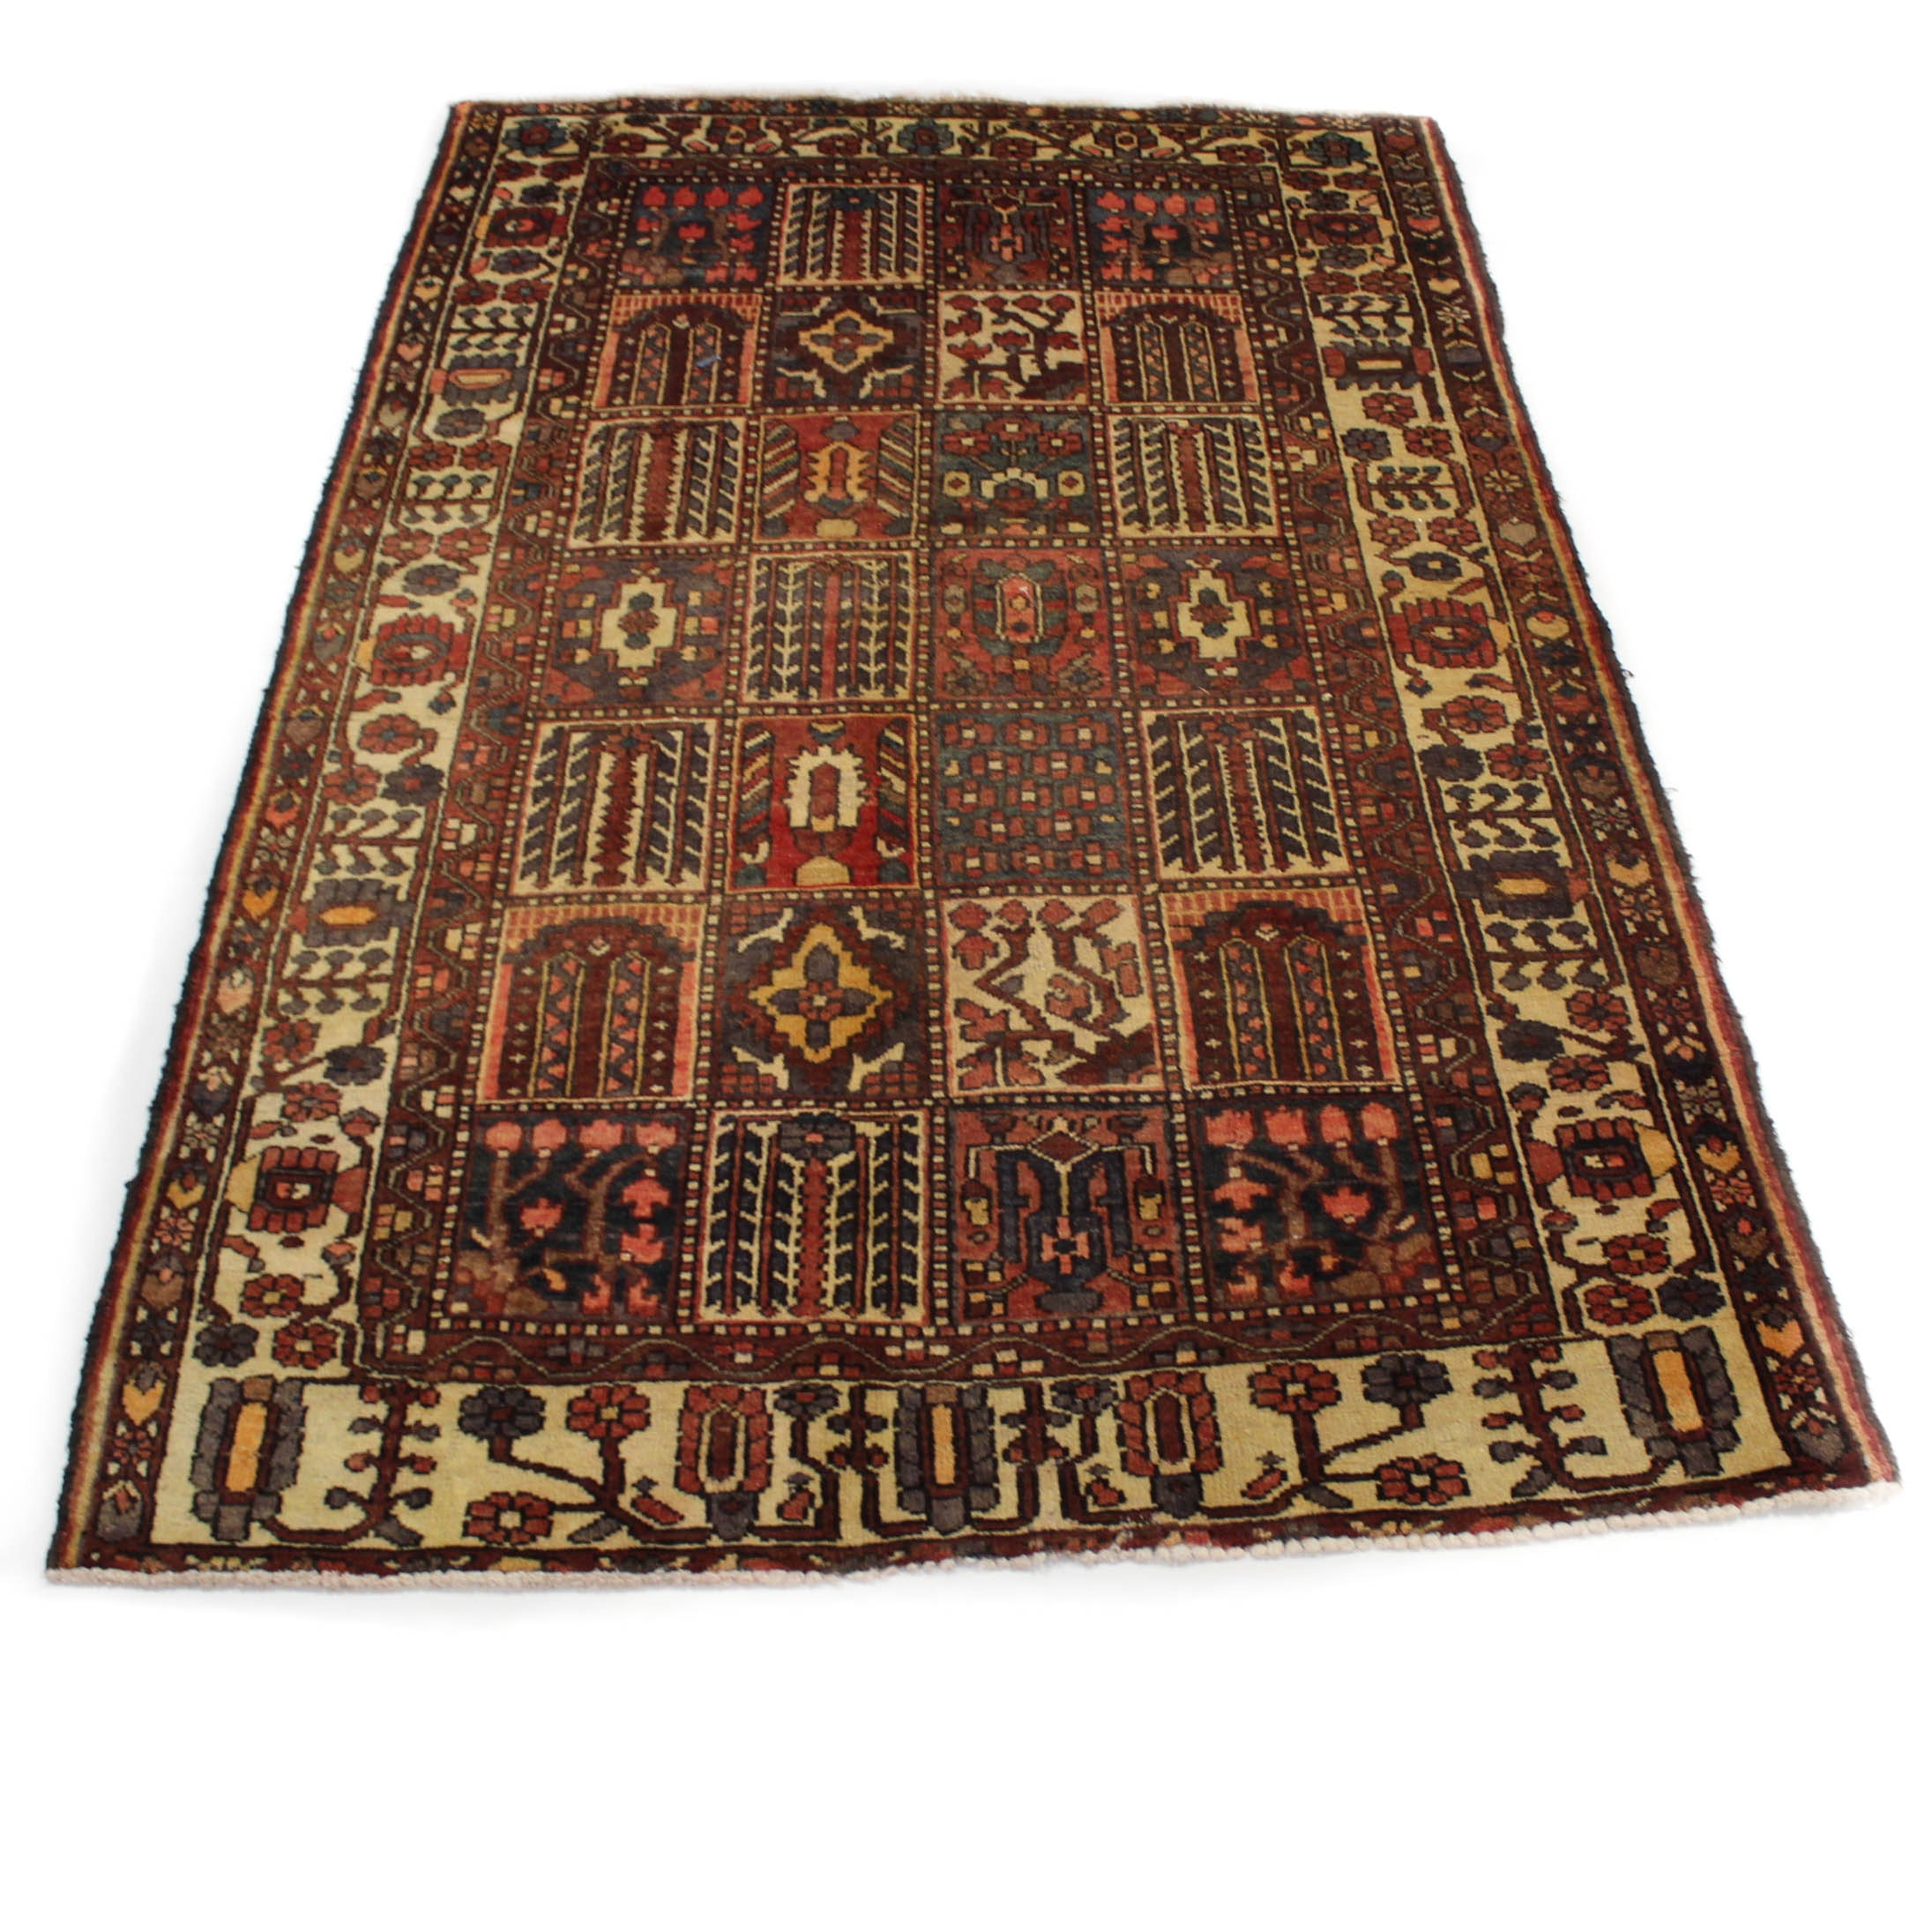 Semi-Antique Hand-Knotted Persian Bakhtiari Rug